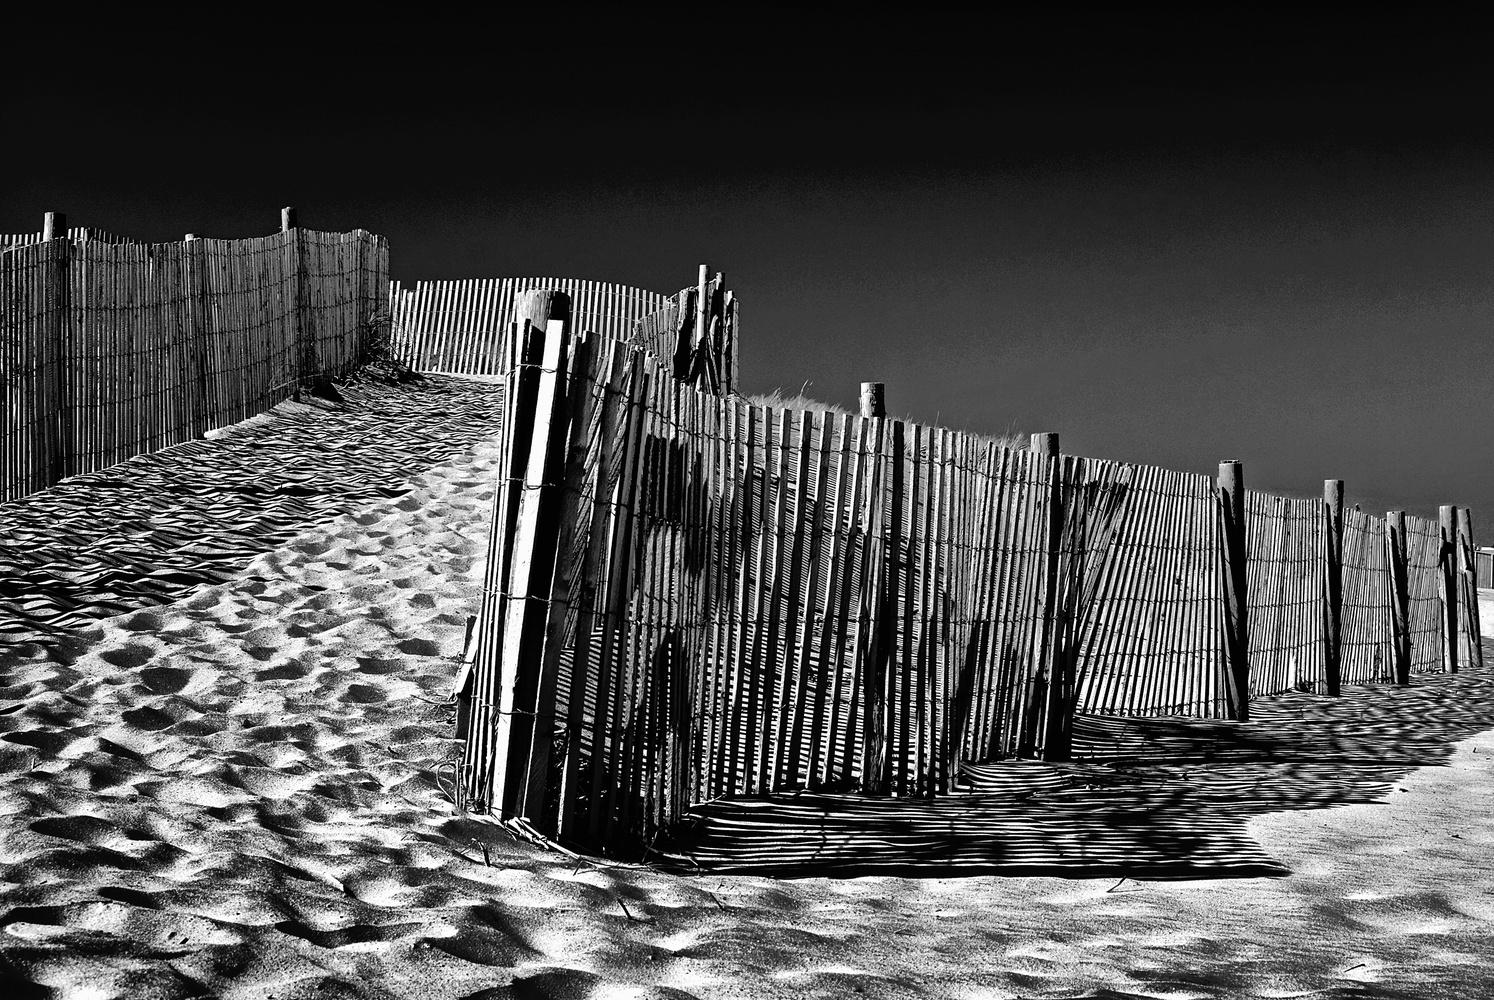 Dune fence, Delmarva seashore. by Bill Jonscher